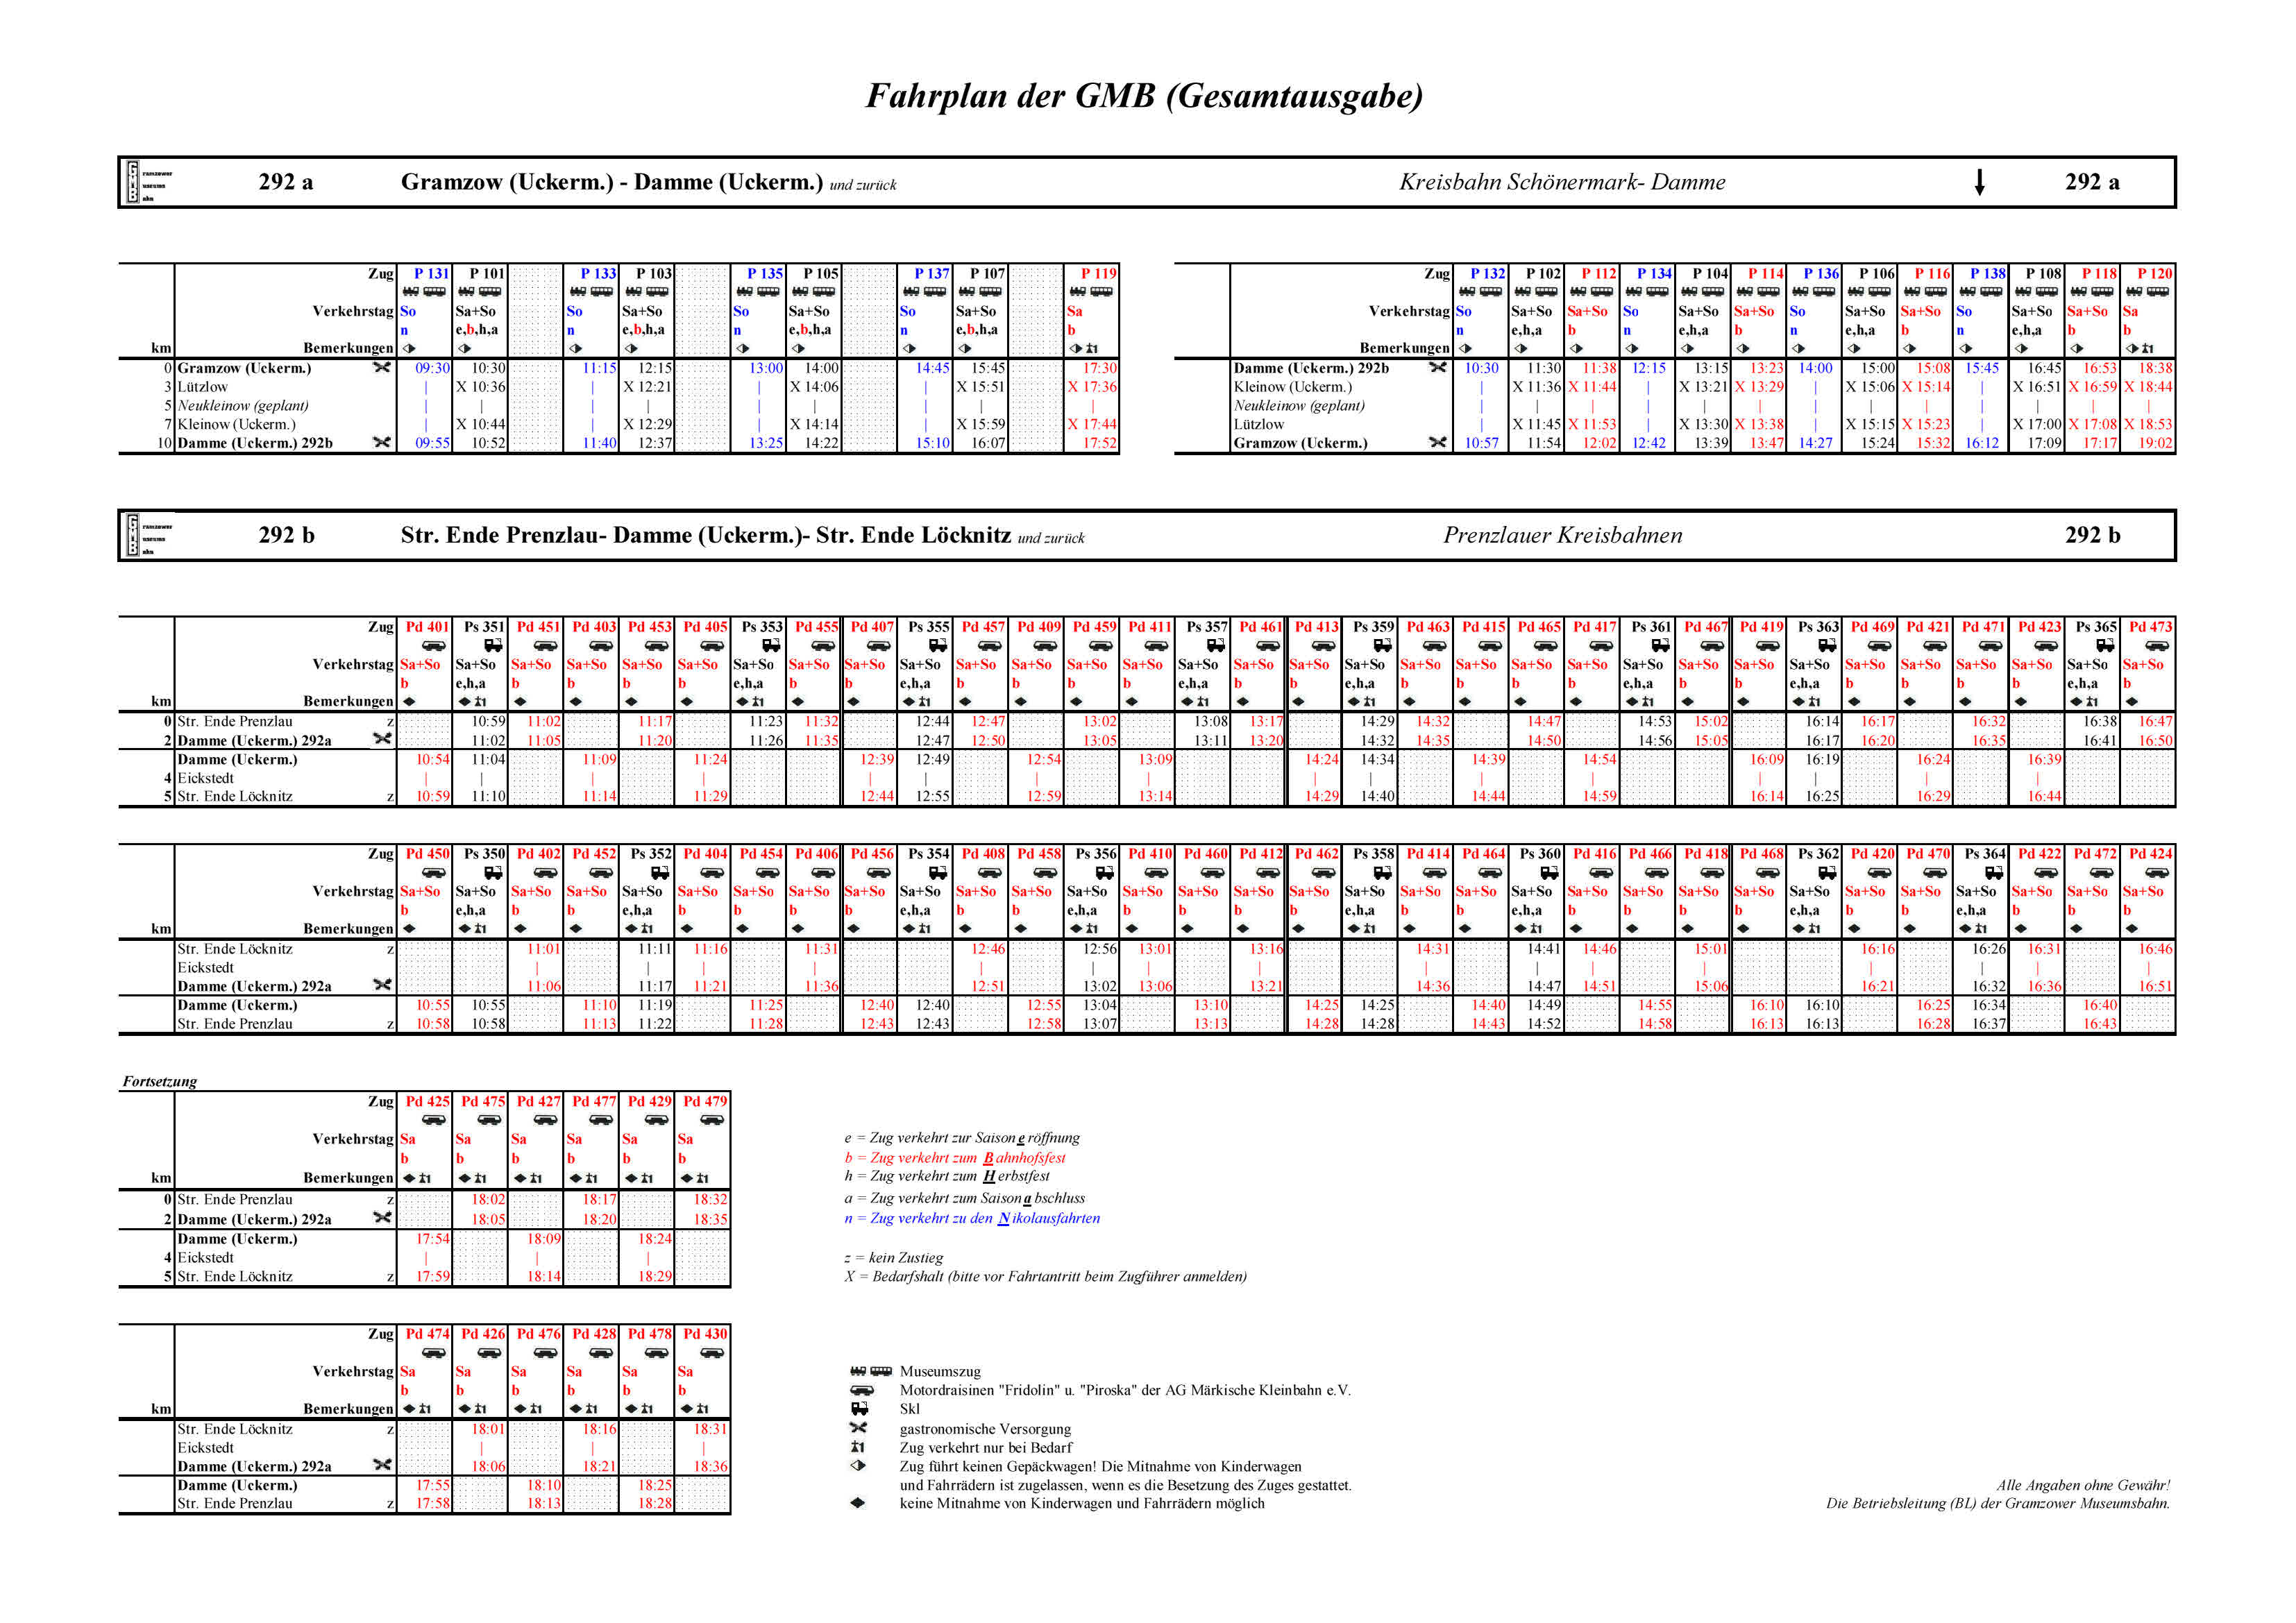 Fahrplan GMB (Gesamtausgabe) KBS 292 a,b